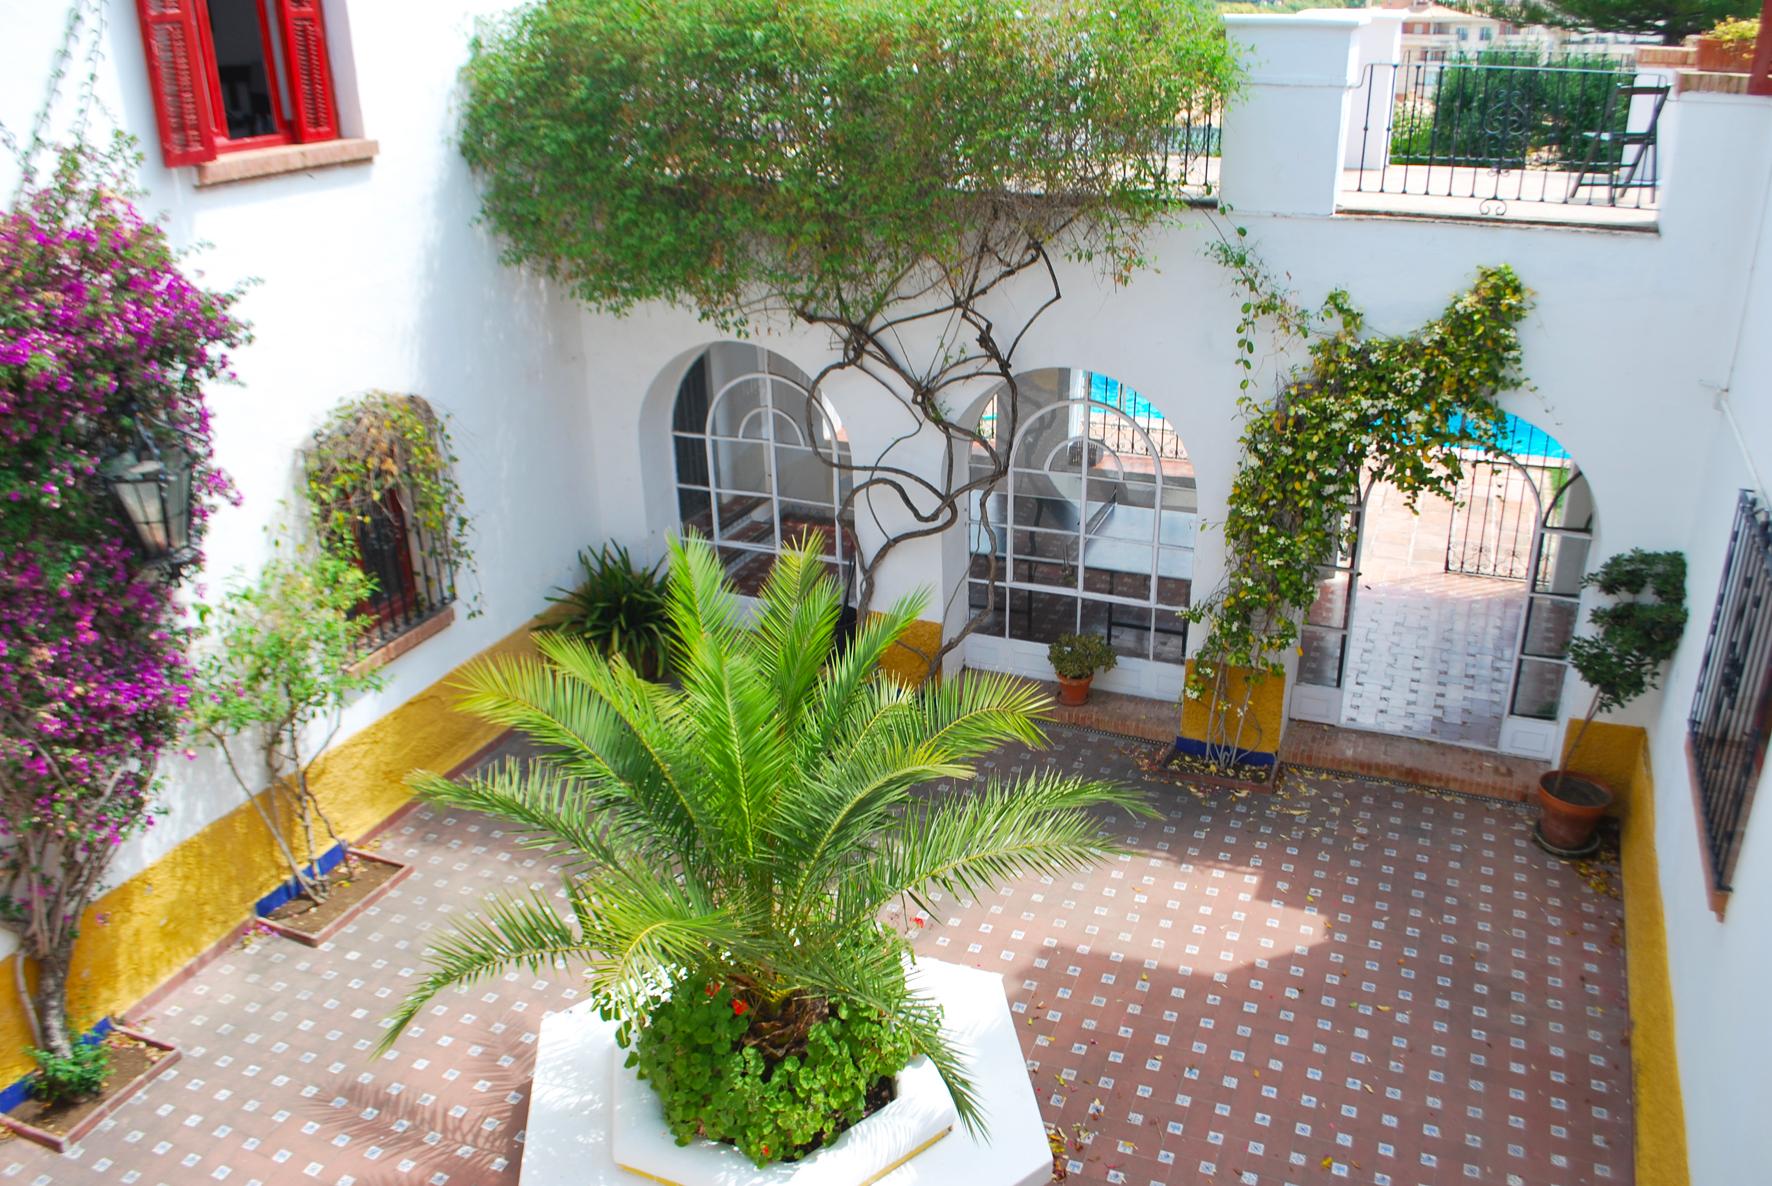 The central courtyard of Hacienda Clavero